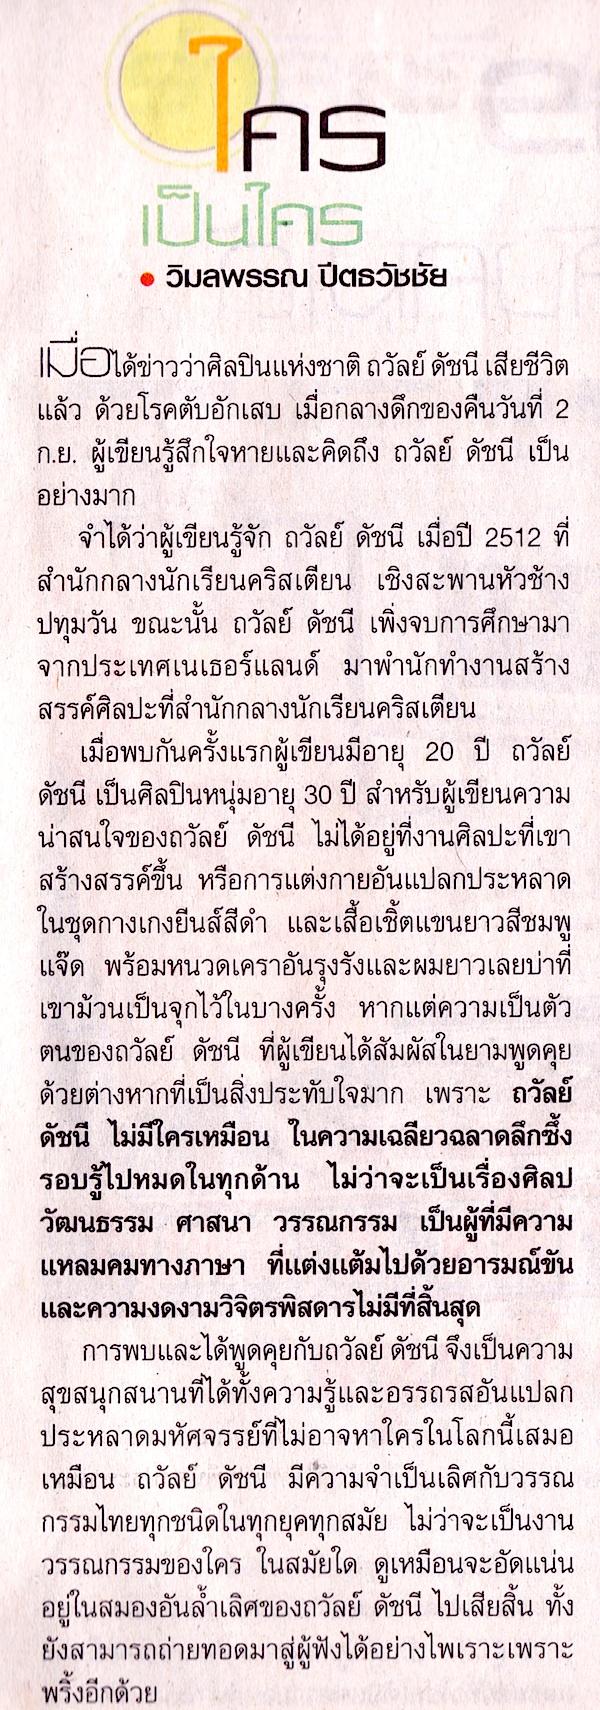 Thaipost9